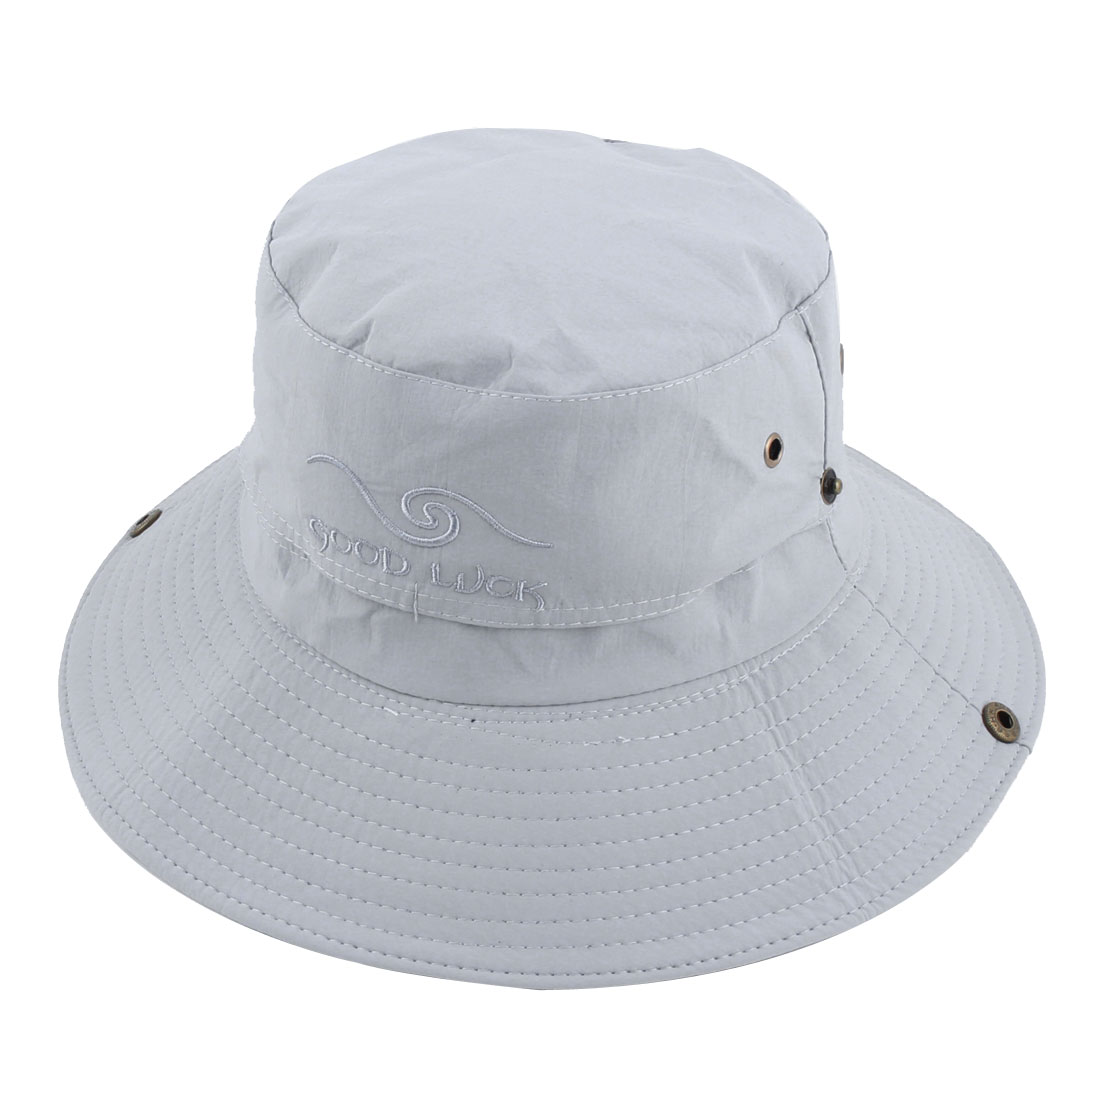 Fisherman Outdoor Sports Hiking Adjustable Strap Mesh Wide Brim Protector Bucket Summer Cap Fishing Hat Gray